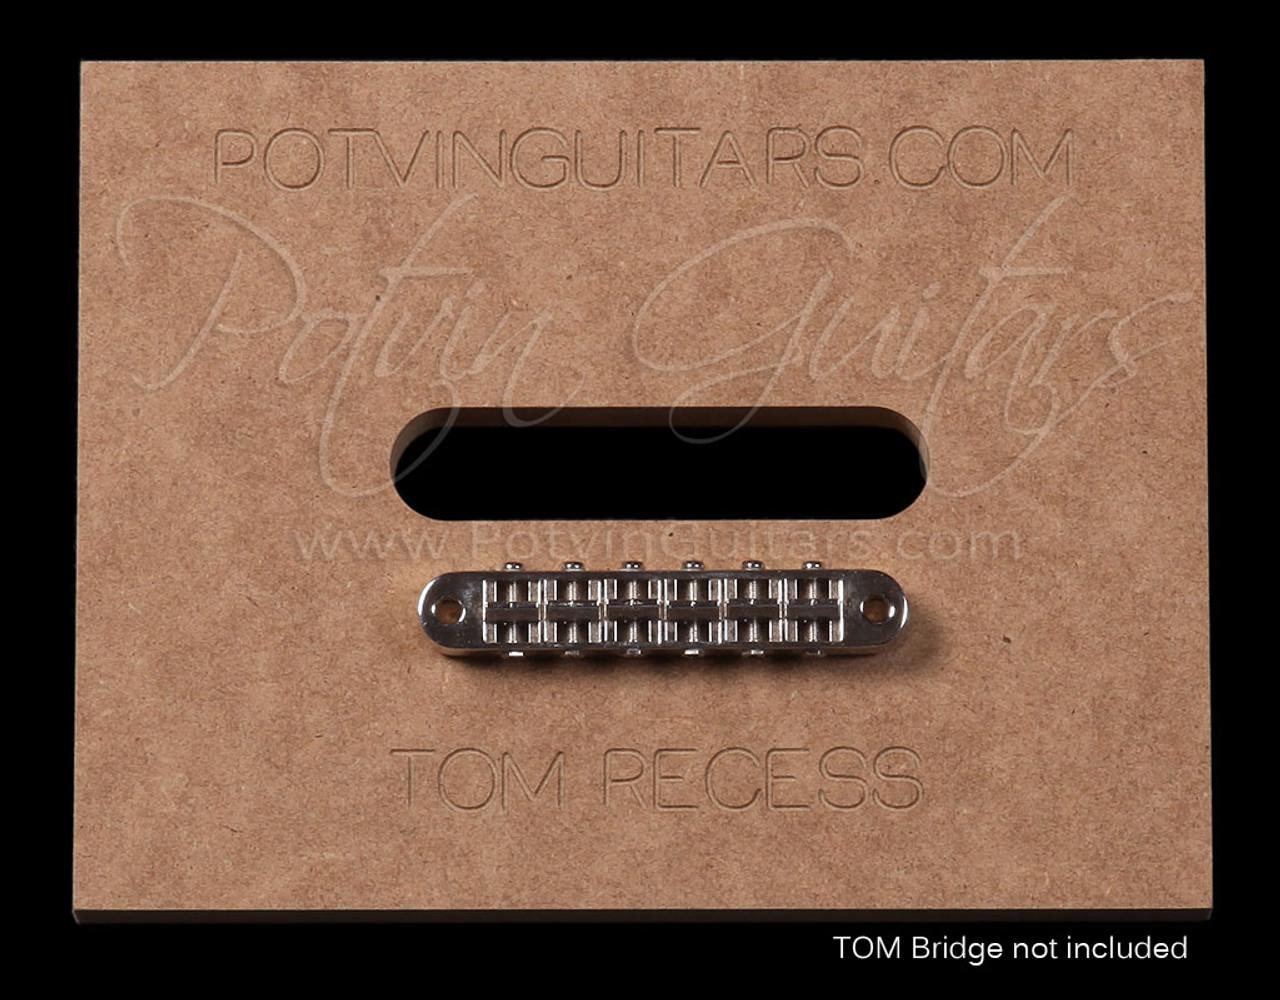 Tune-o-matic bridge recess template